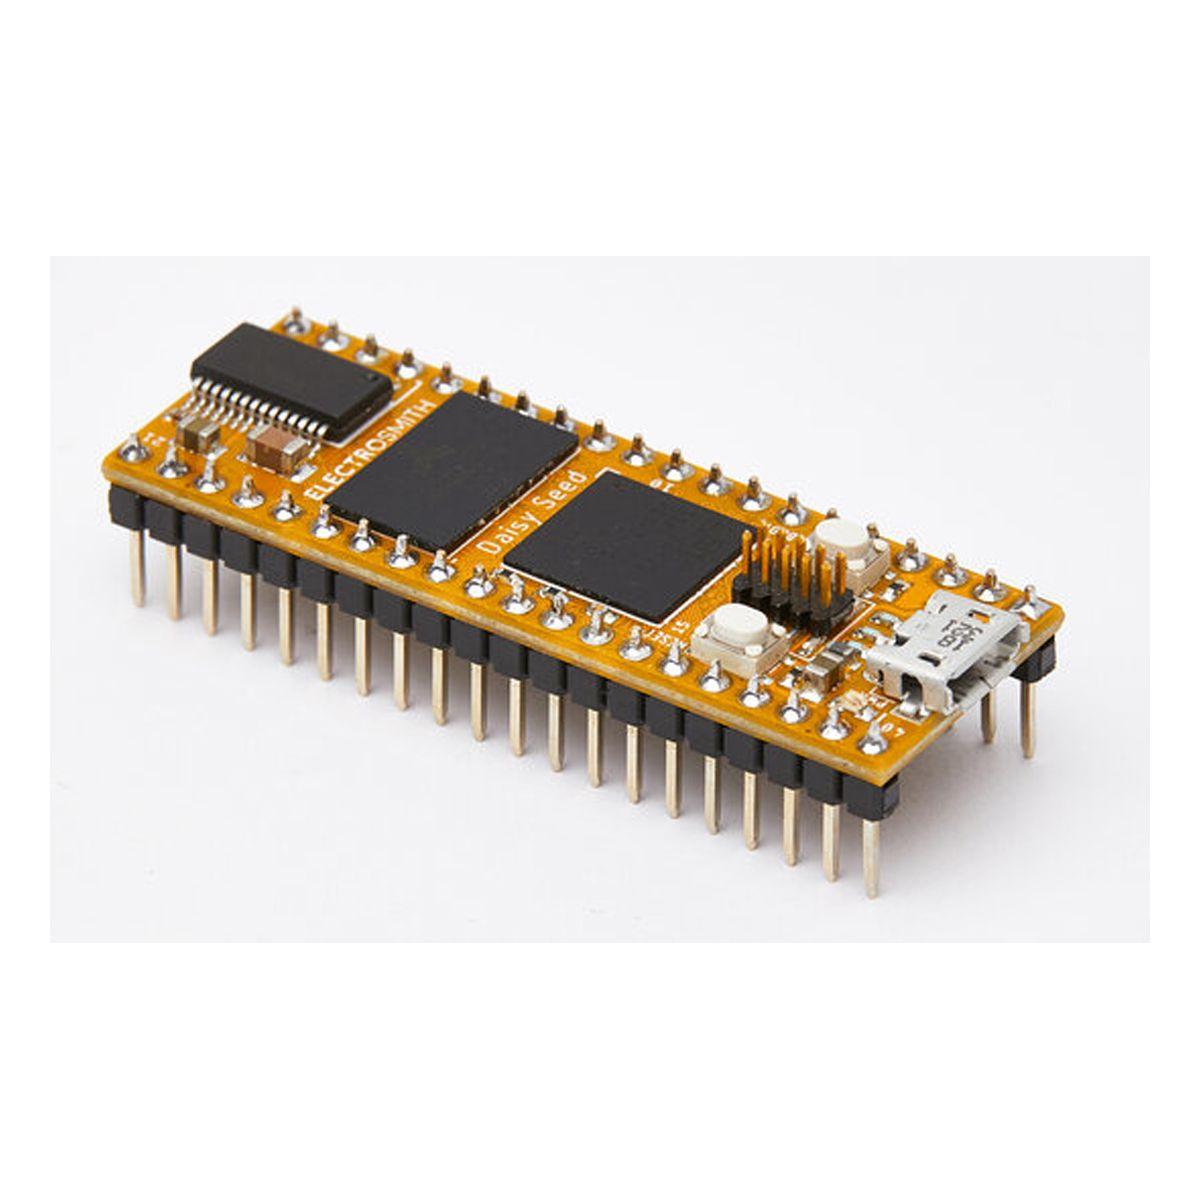 Electro-Smith Daisy Seed Development Board